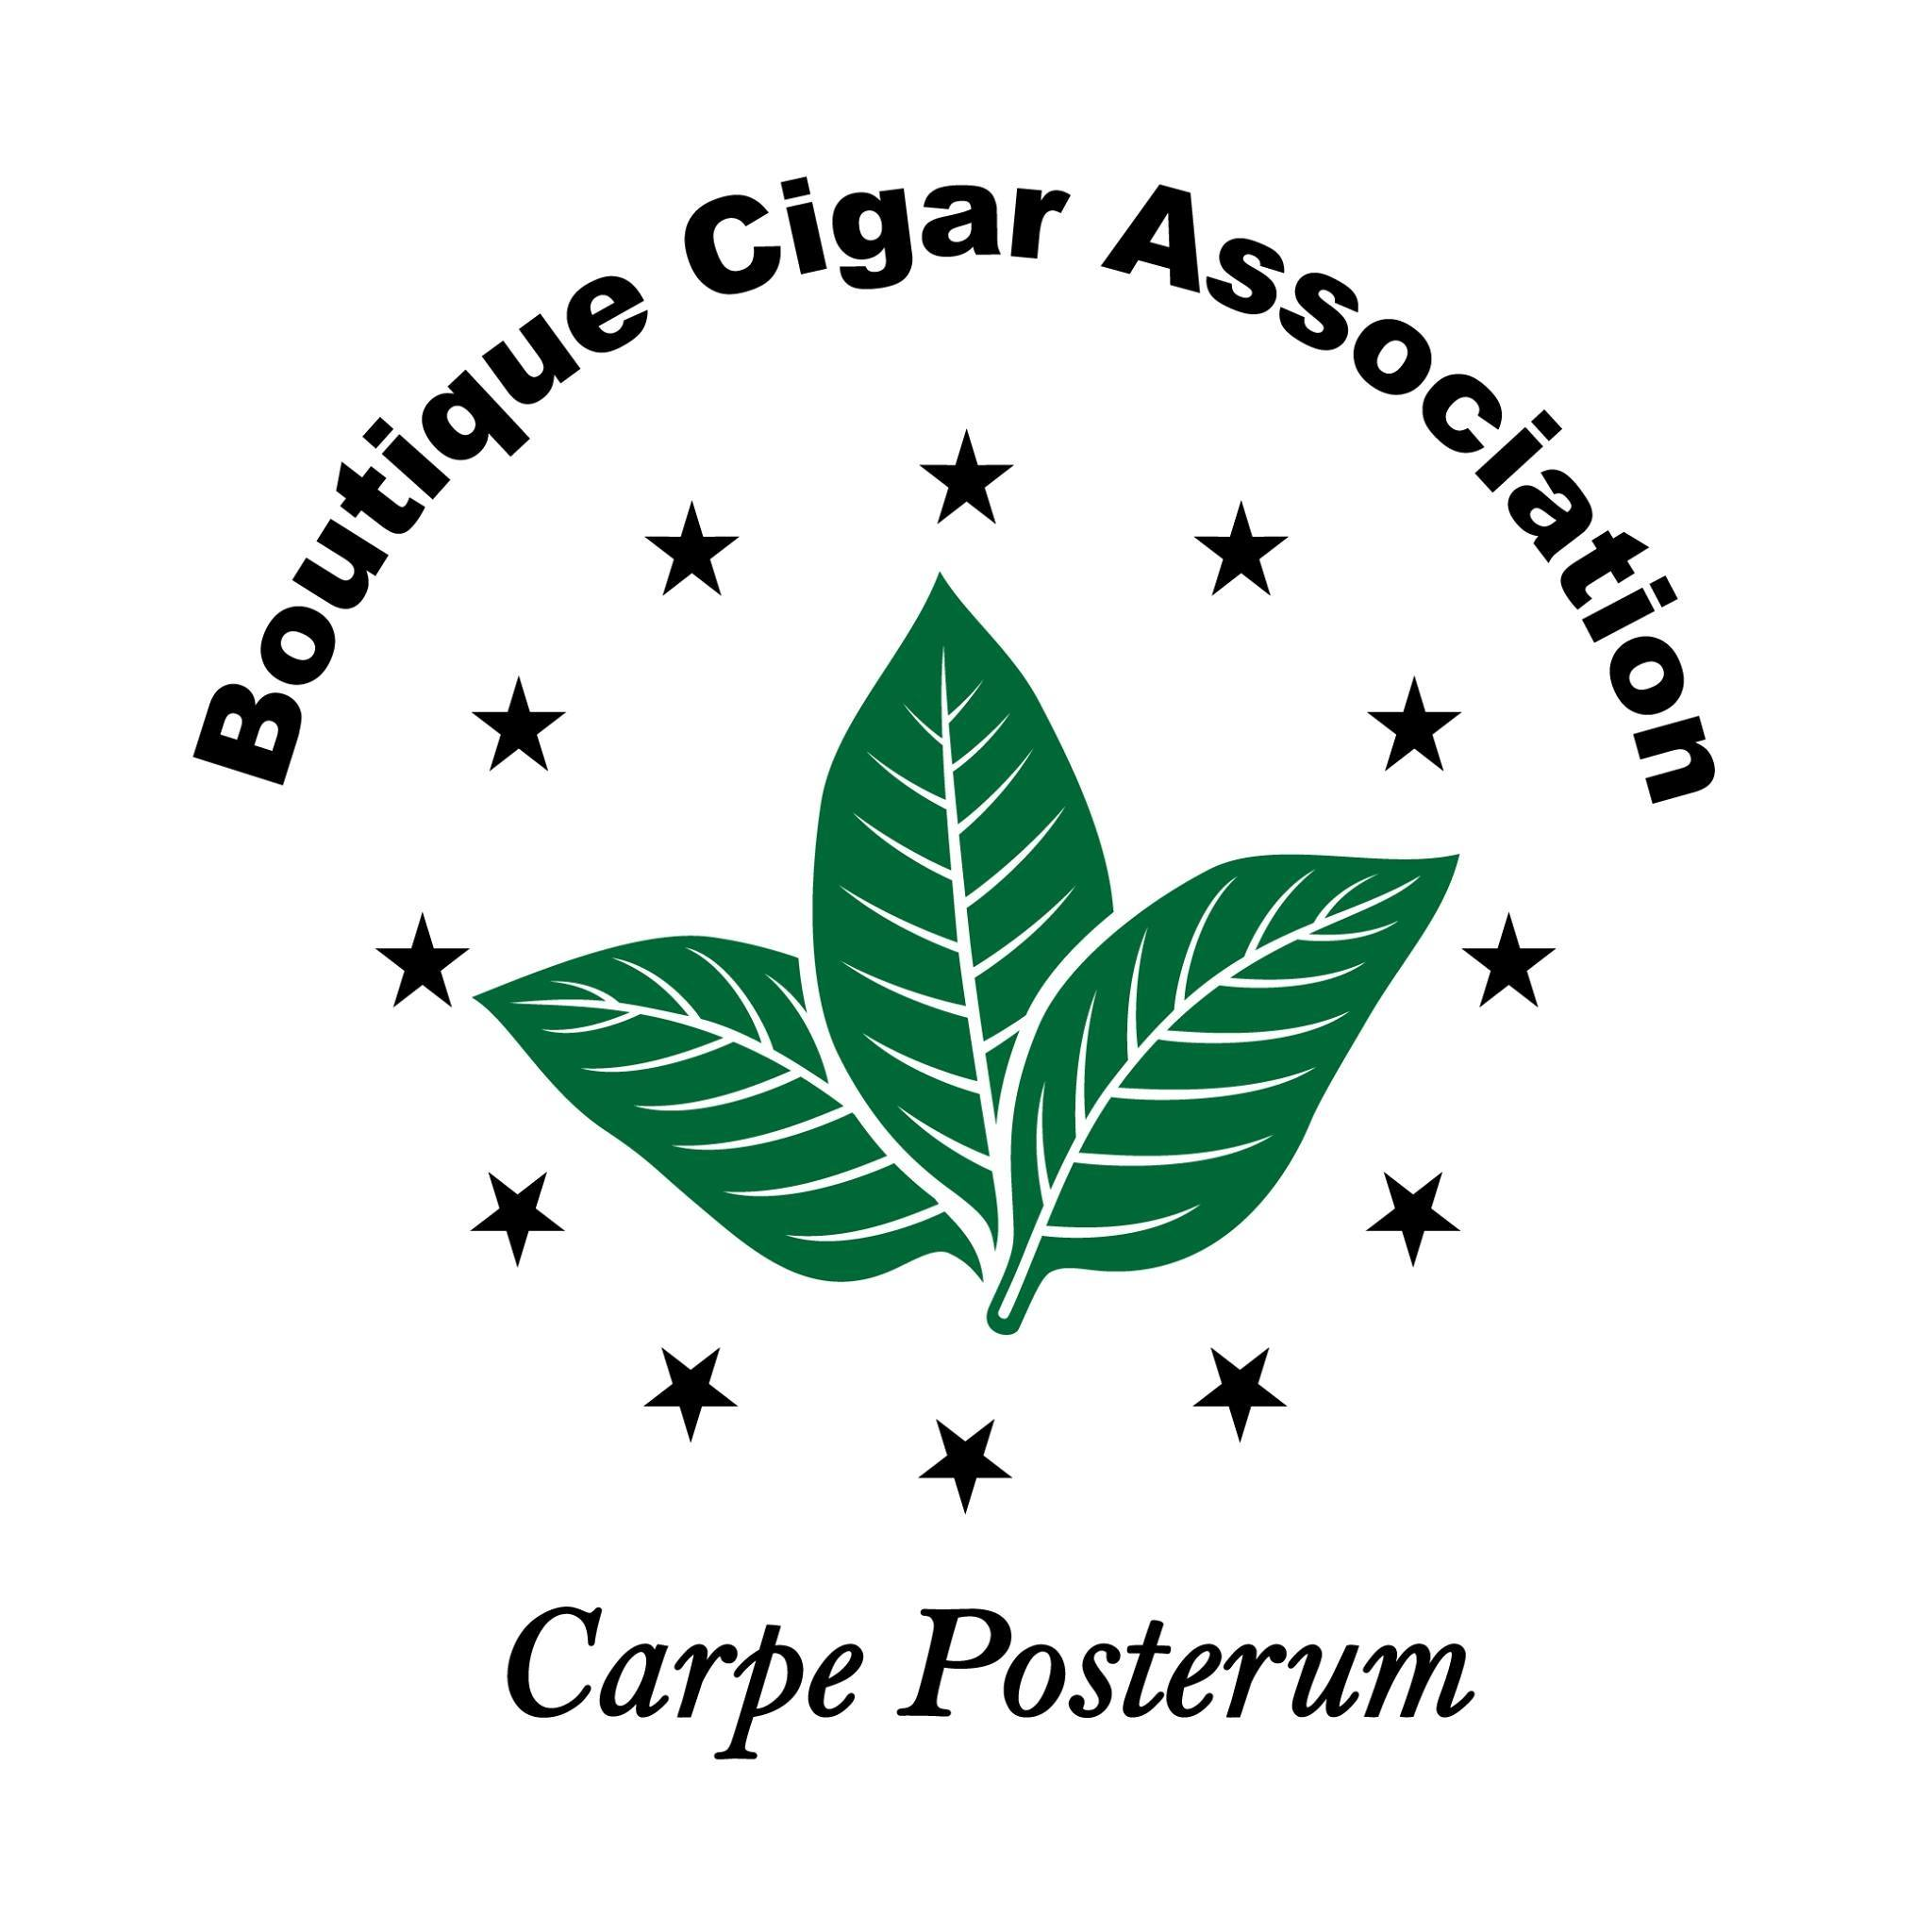 Cigar News: Boutique Cigar Association Ends Non-Profit Status and Moves to Social Community Platform